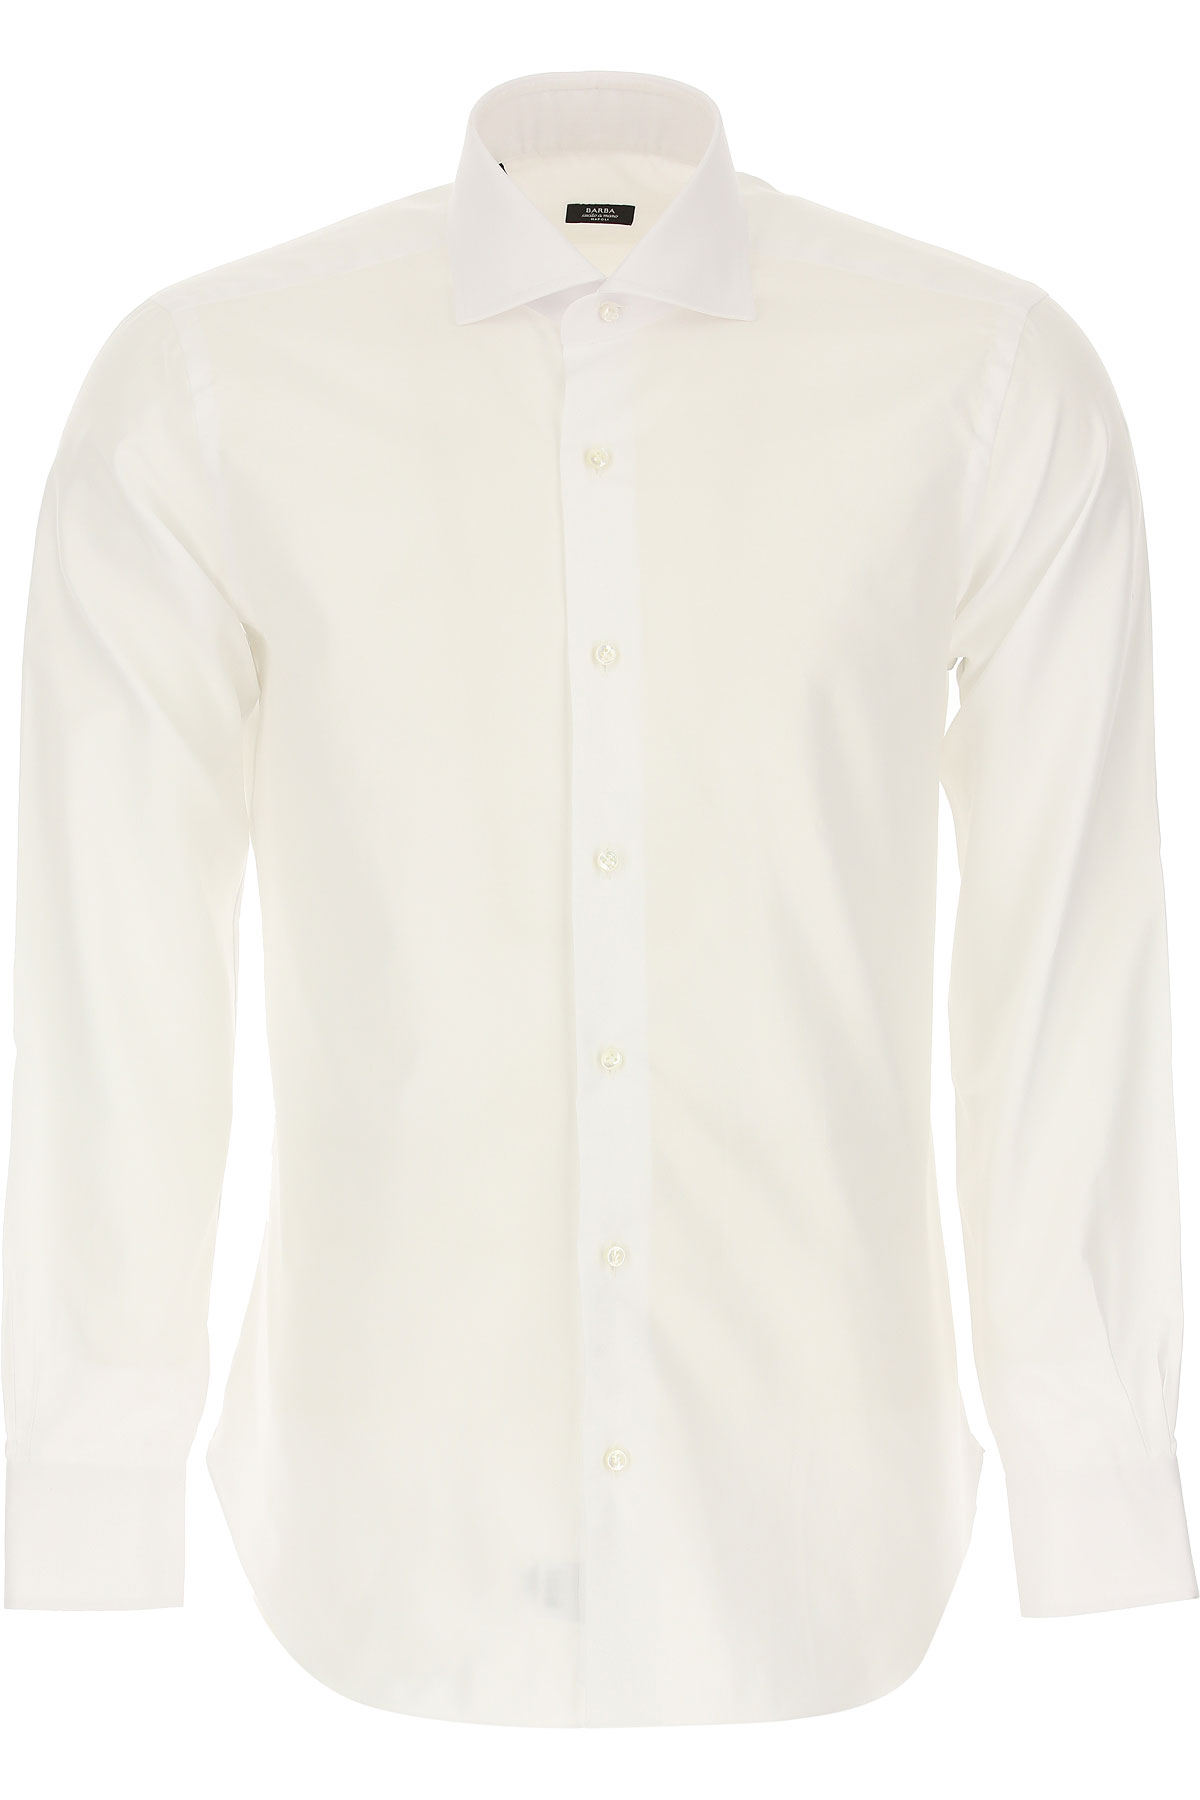 Barba Shirt for Men On Sale, White, Cotton, 2019, 16.5 17 17.5